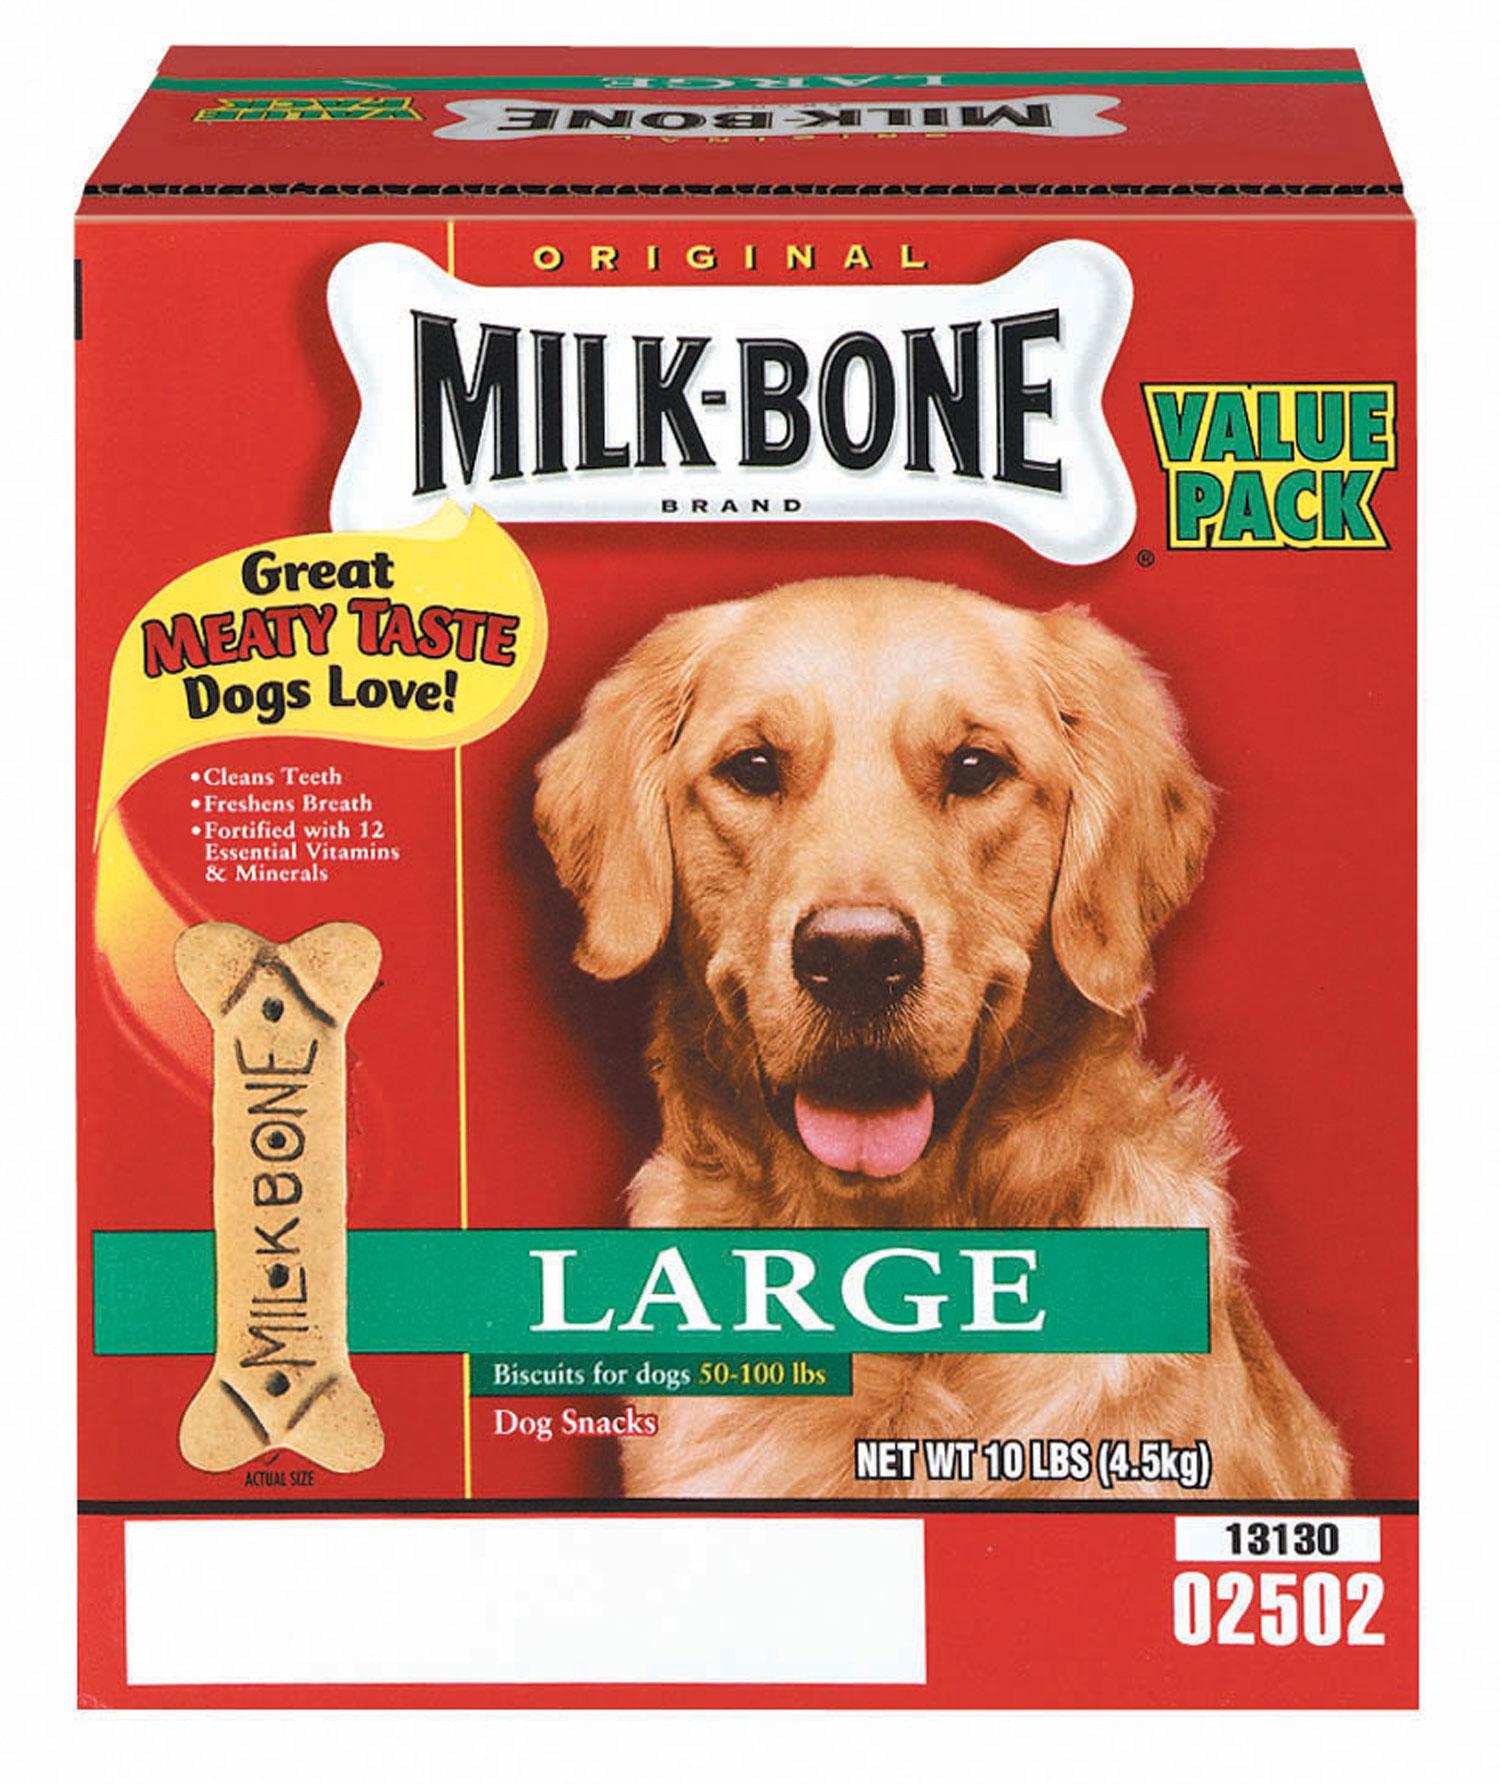 Milk Bone Dog Treats Recall